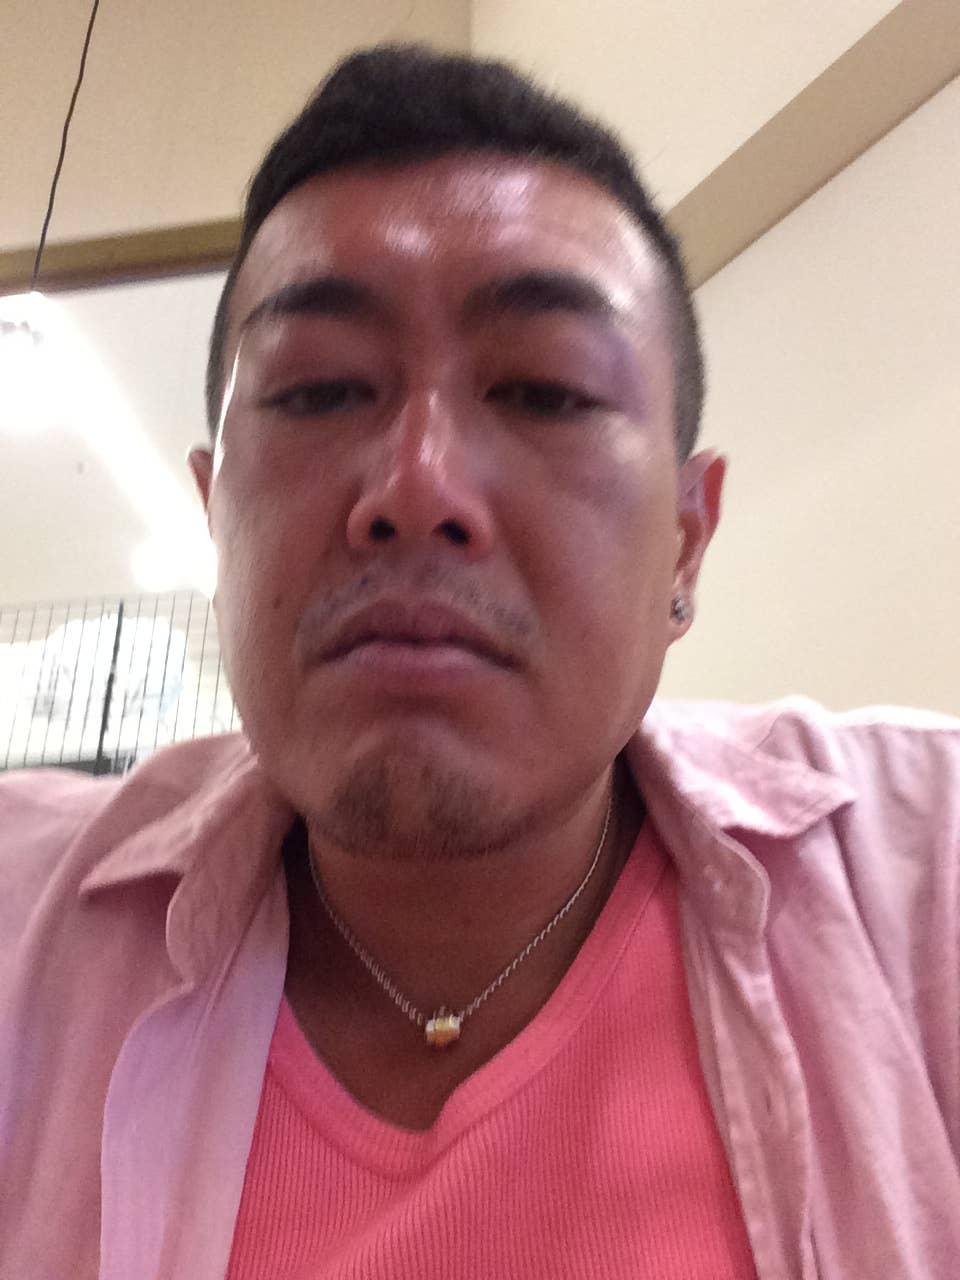 Ren Matsuda